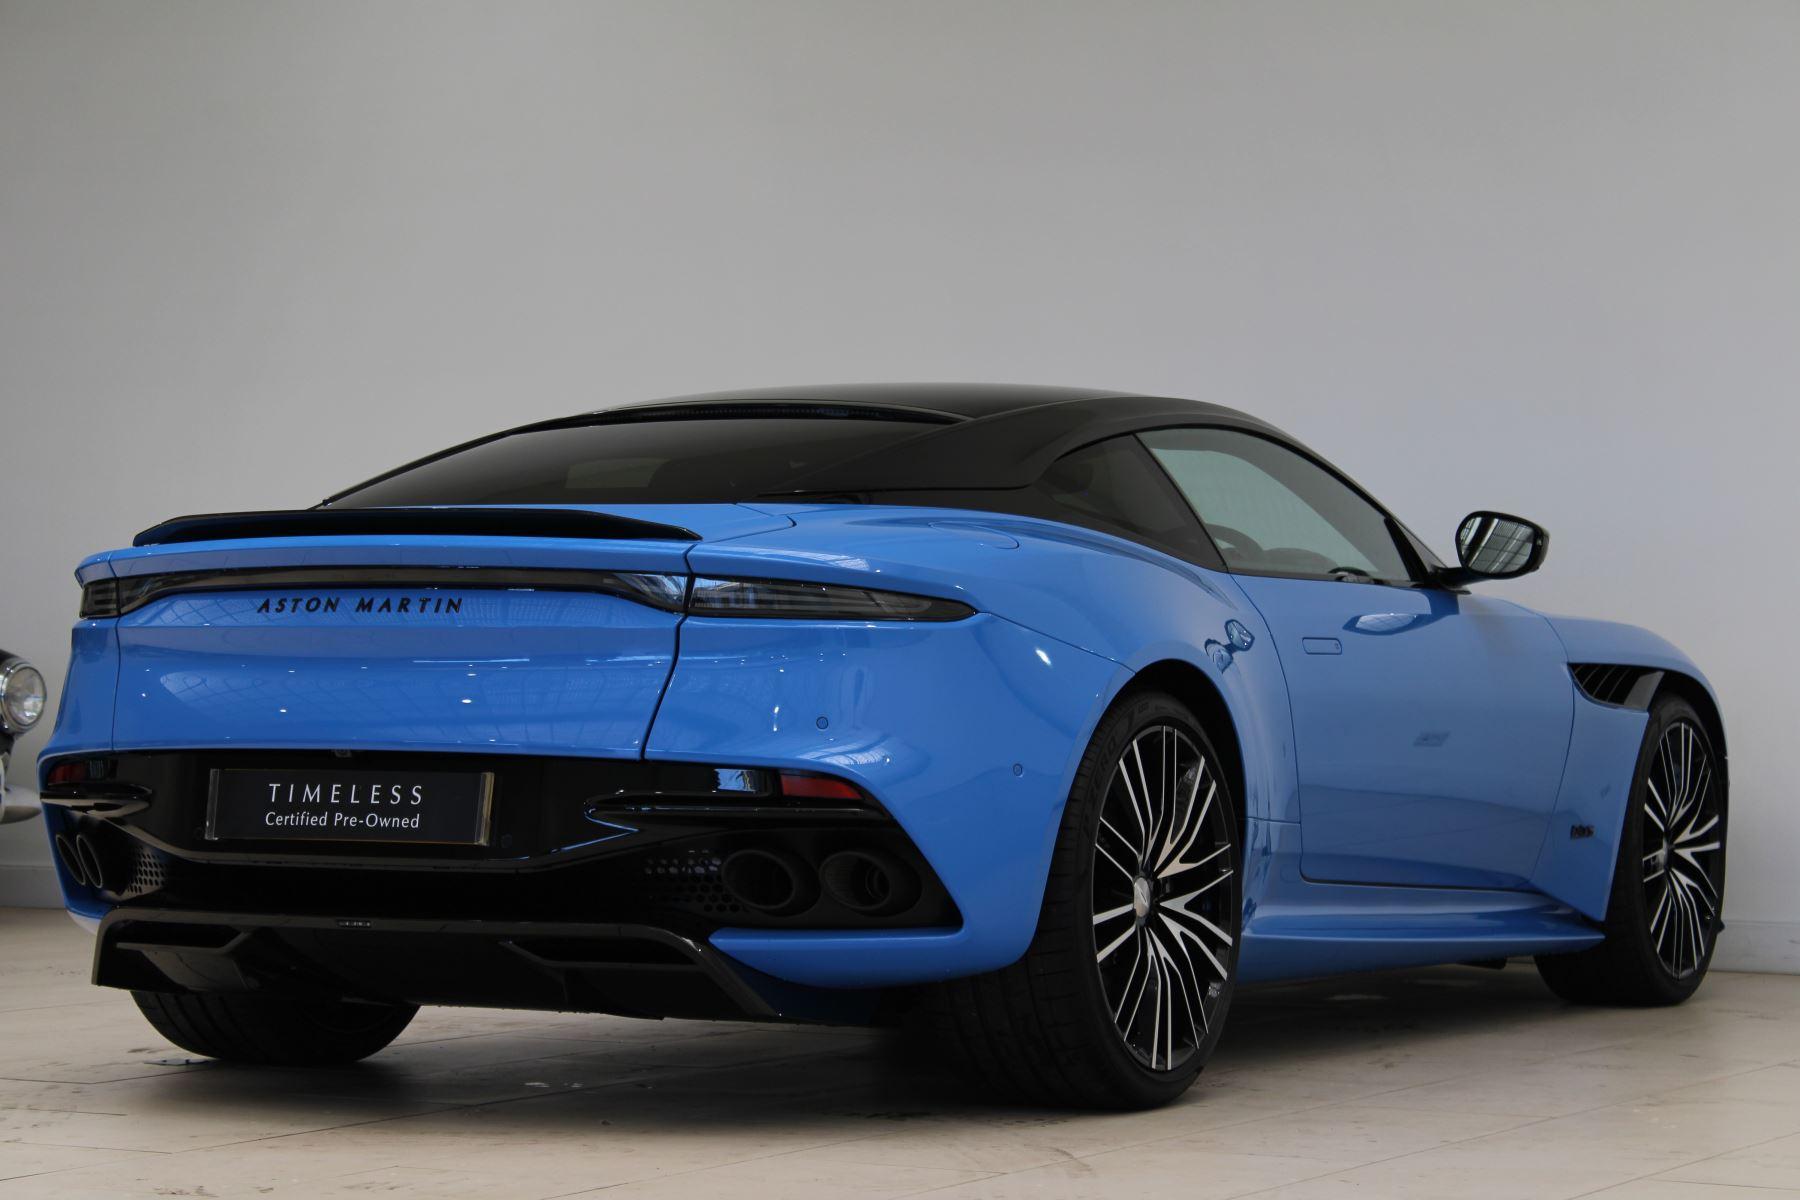 Aston Martin DBS V12 Superleggera Touchtronic Special Ceramic Blue - B&O image 7